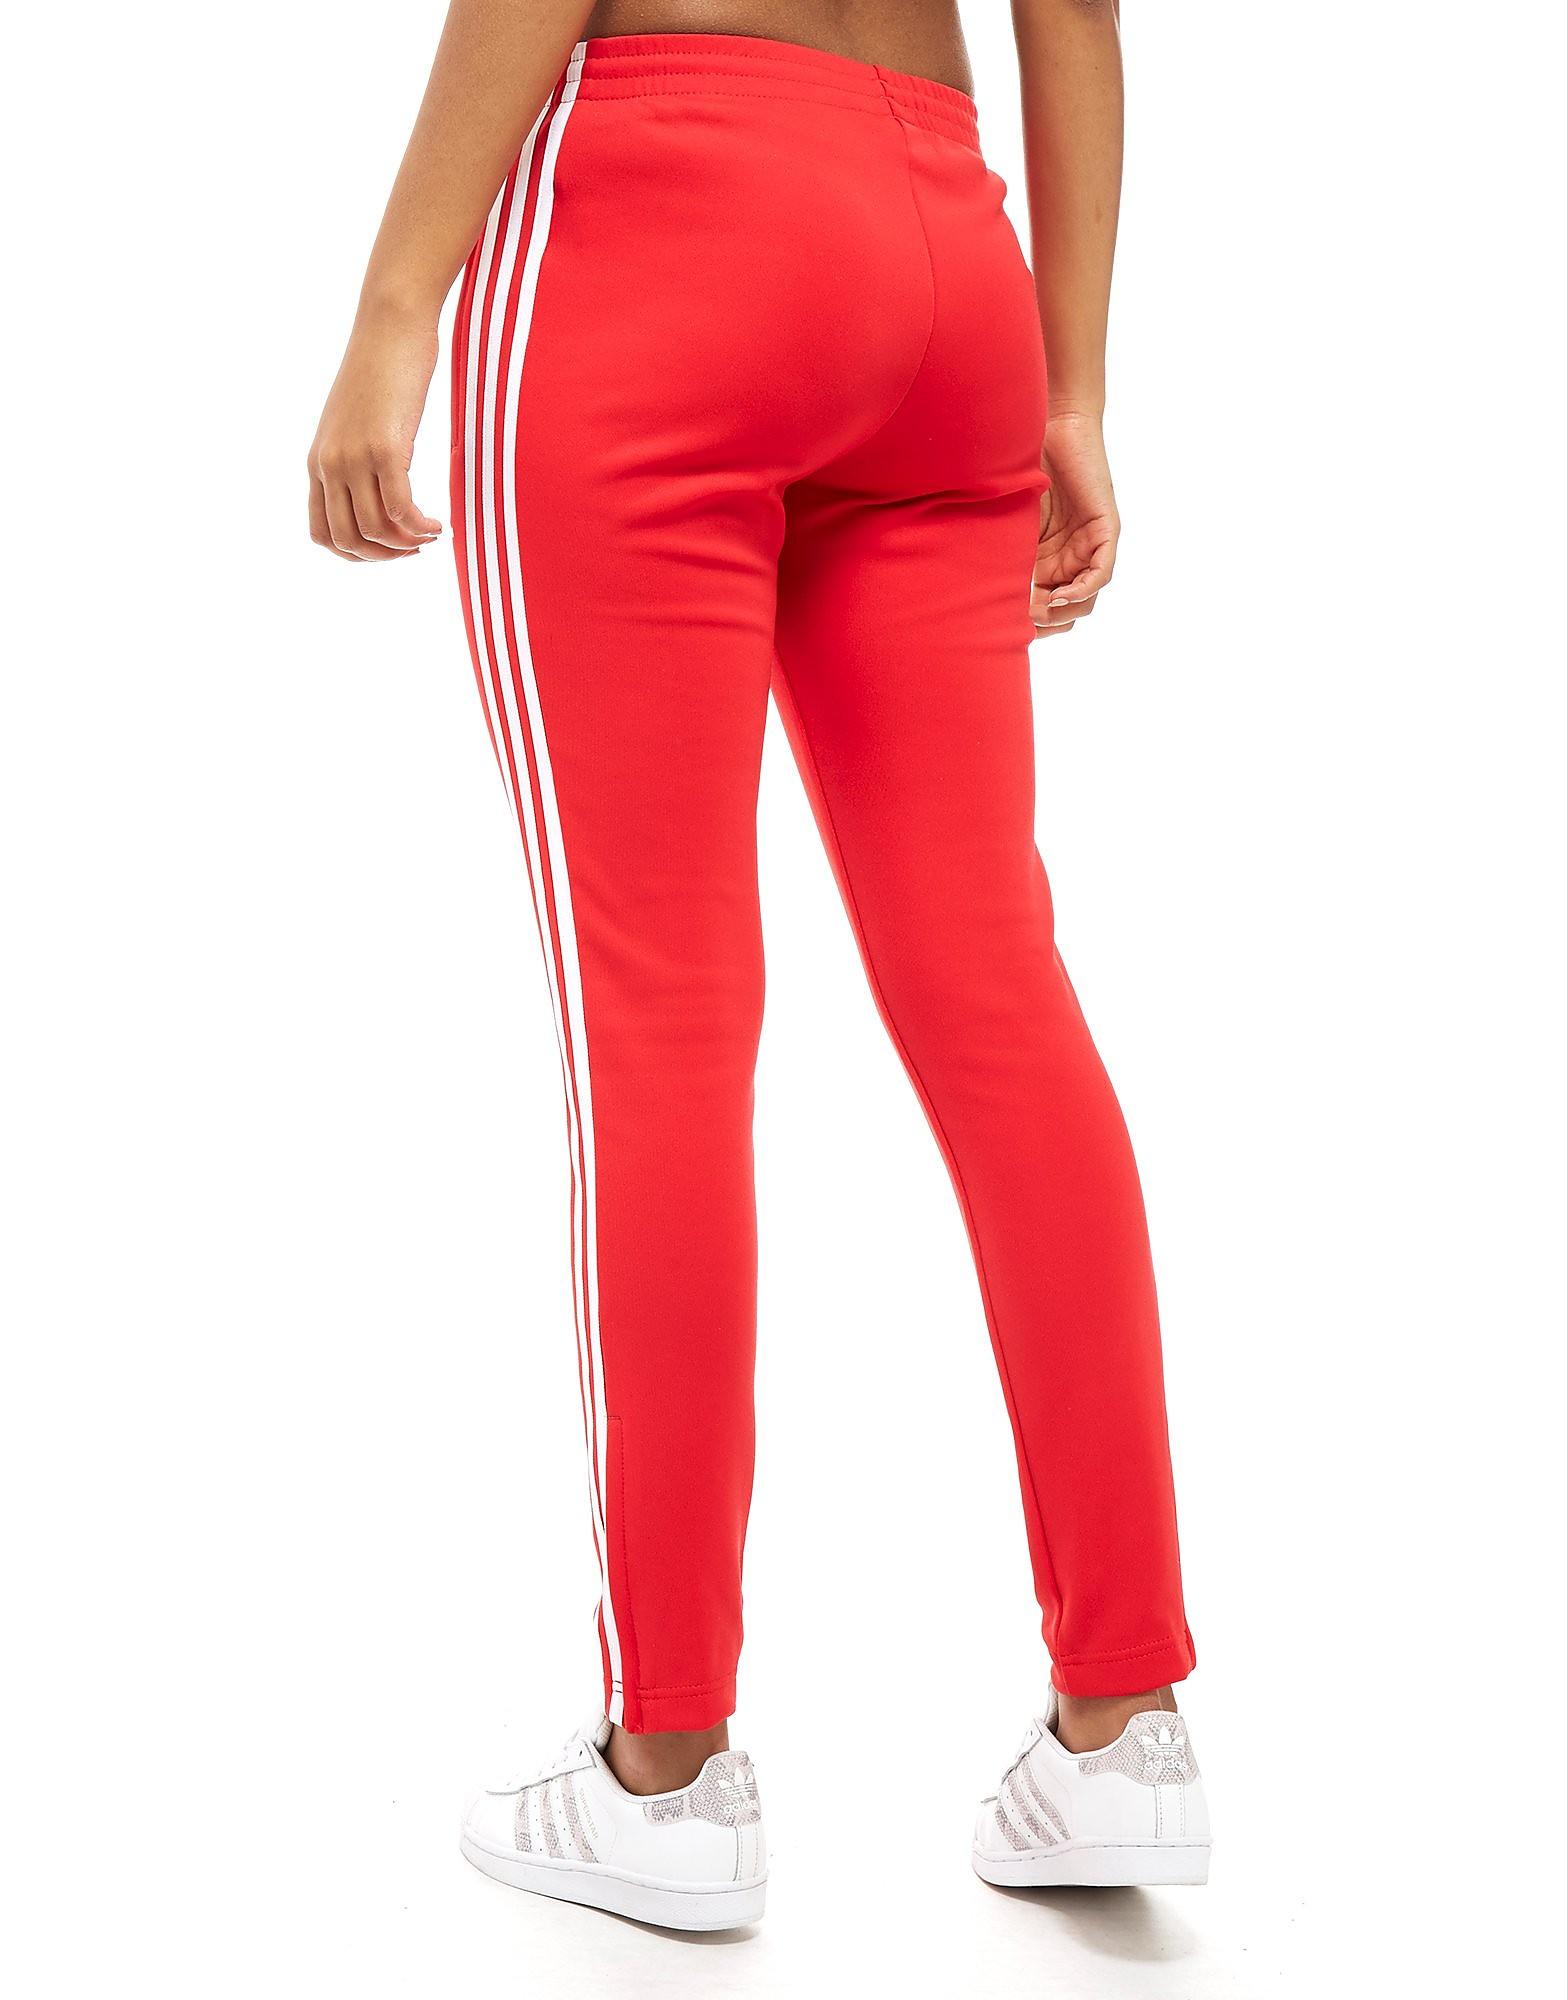 adidas Originals Superstar Pantaloni Donna